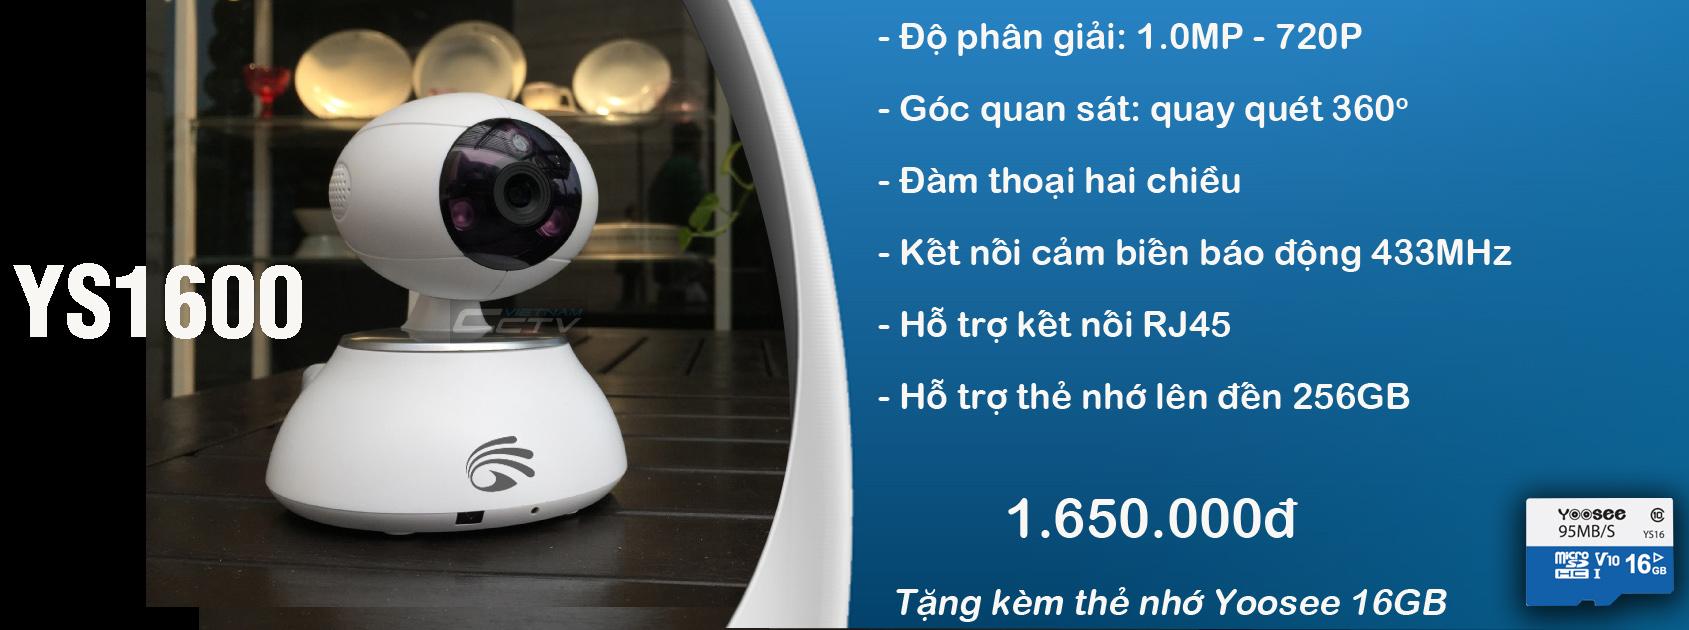 camera yoosee ys1600